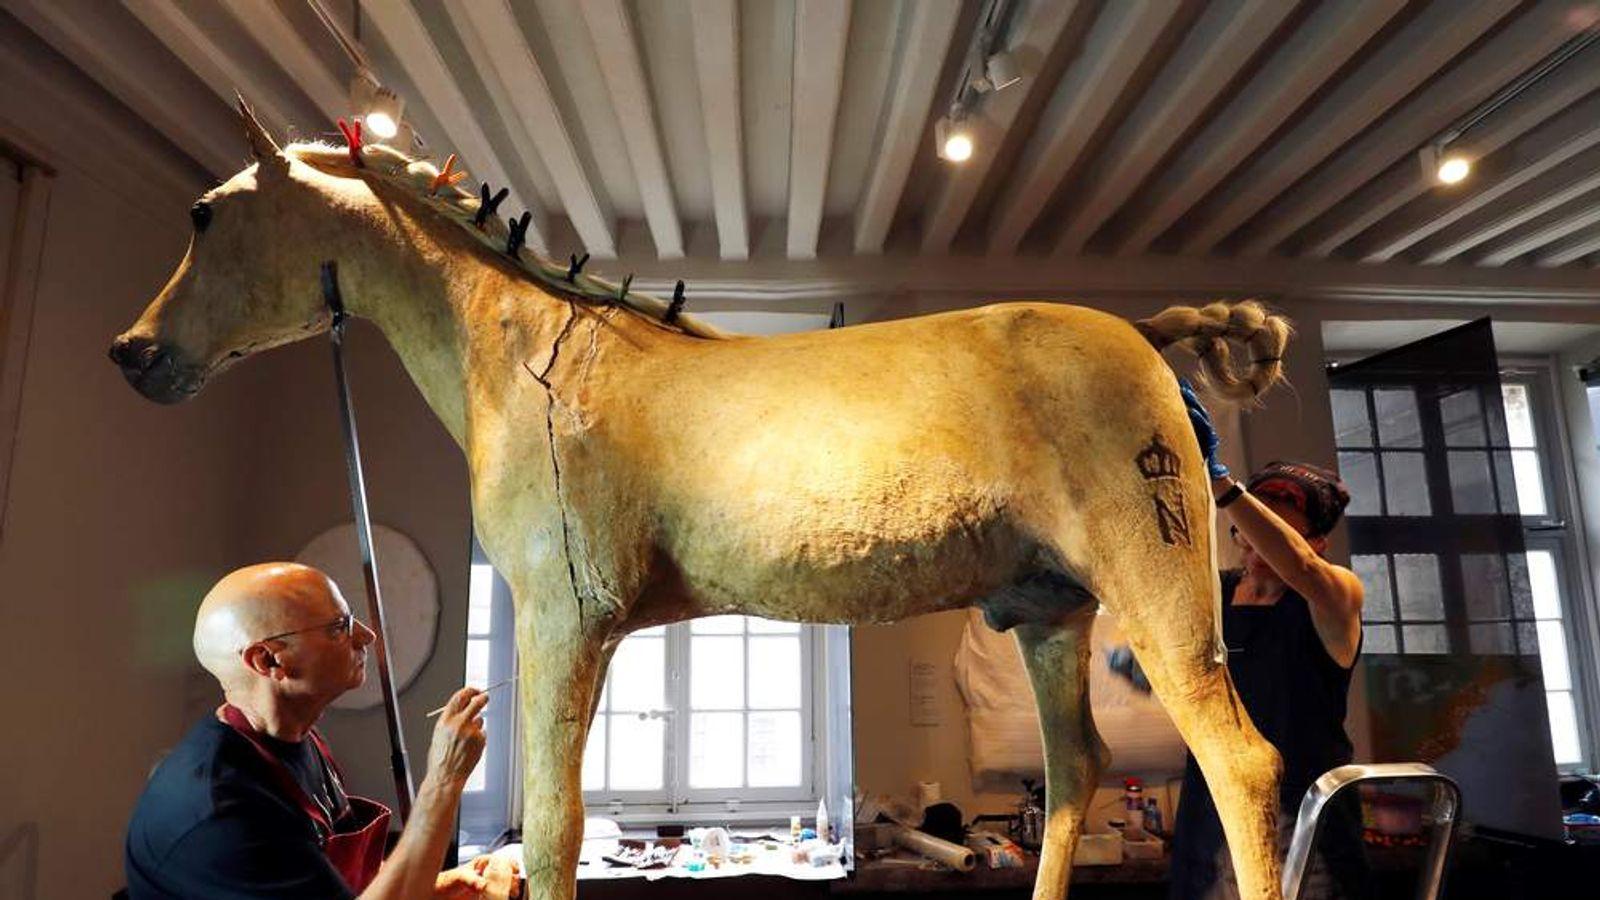 Napoleon S Stuffed Horse Gets Paris Makeover World News